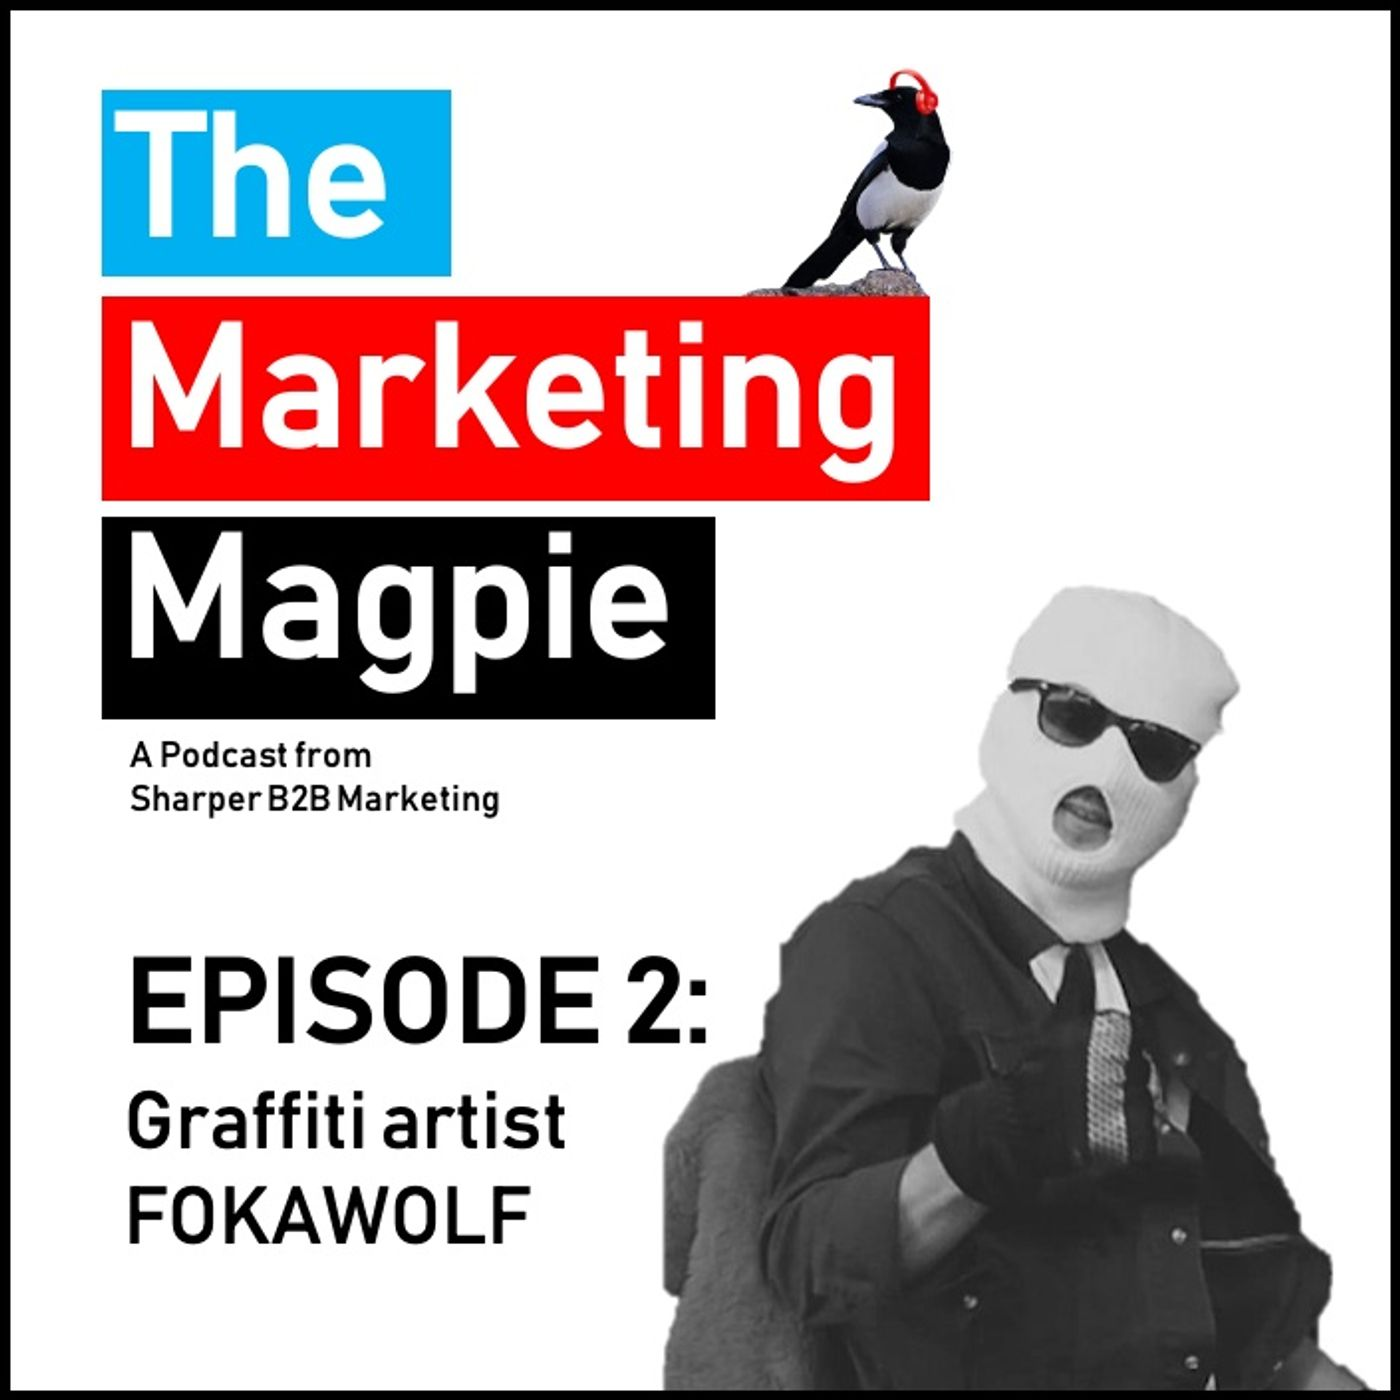 The Marketing Magpie - Episode 2 - Graffiti Artist FOKAWOLF